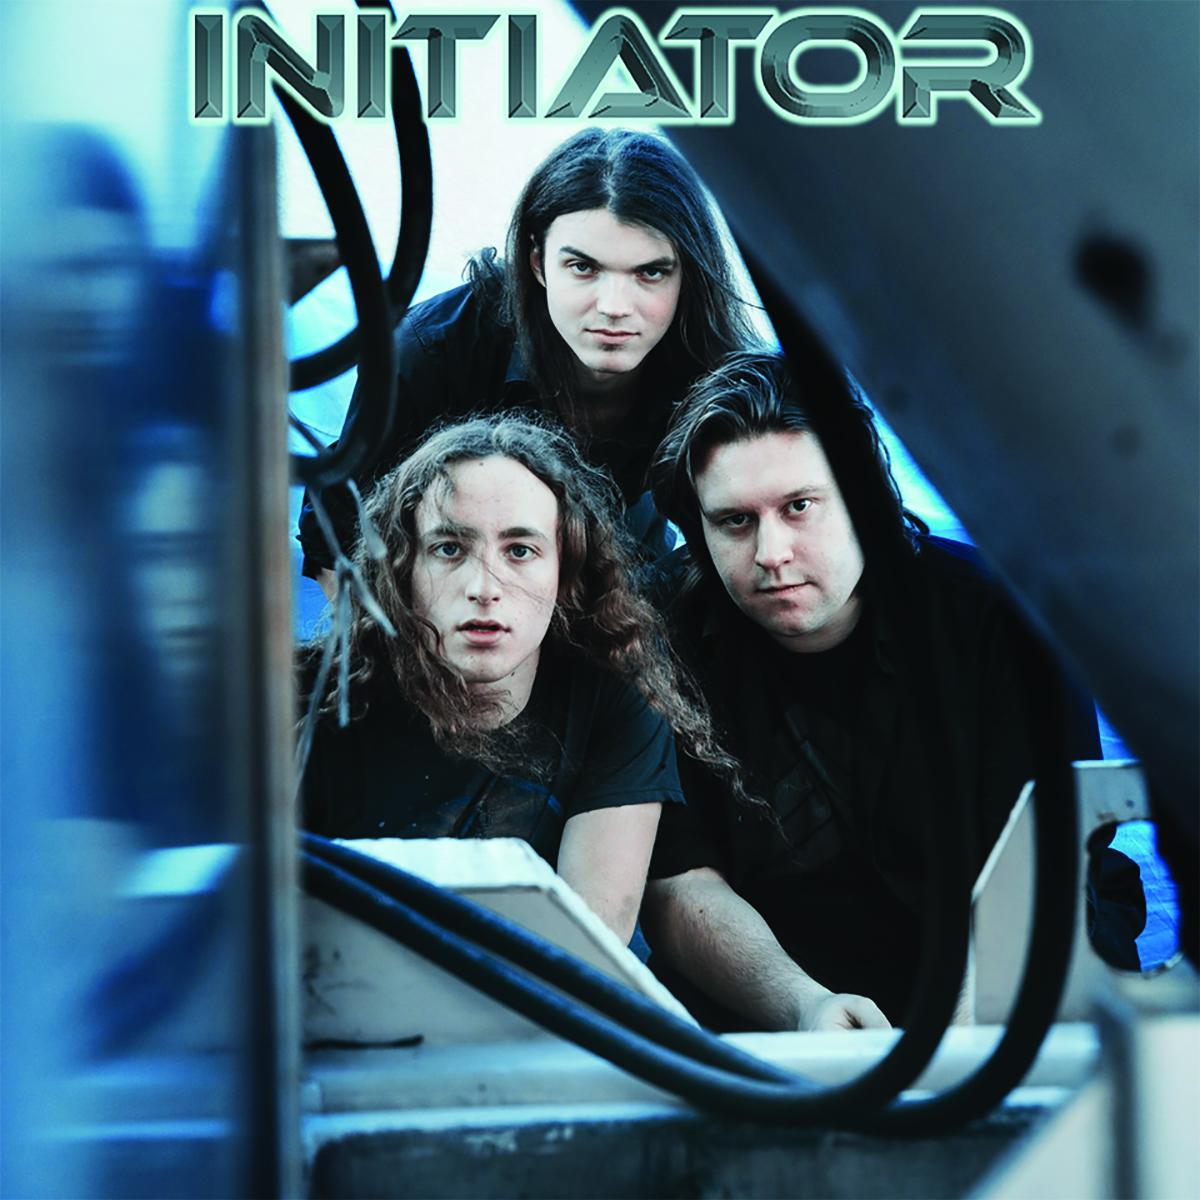 Spotlight-initiator-P5